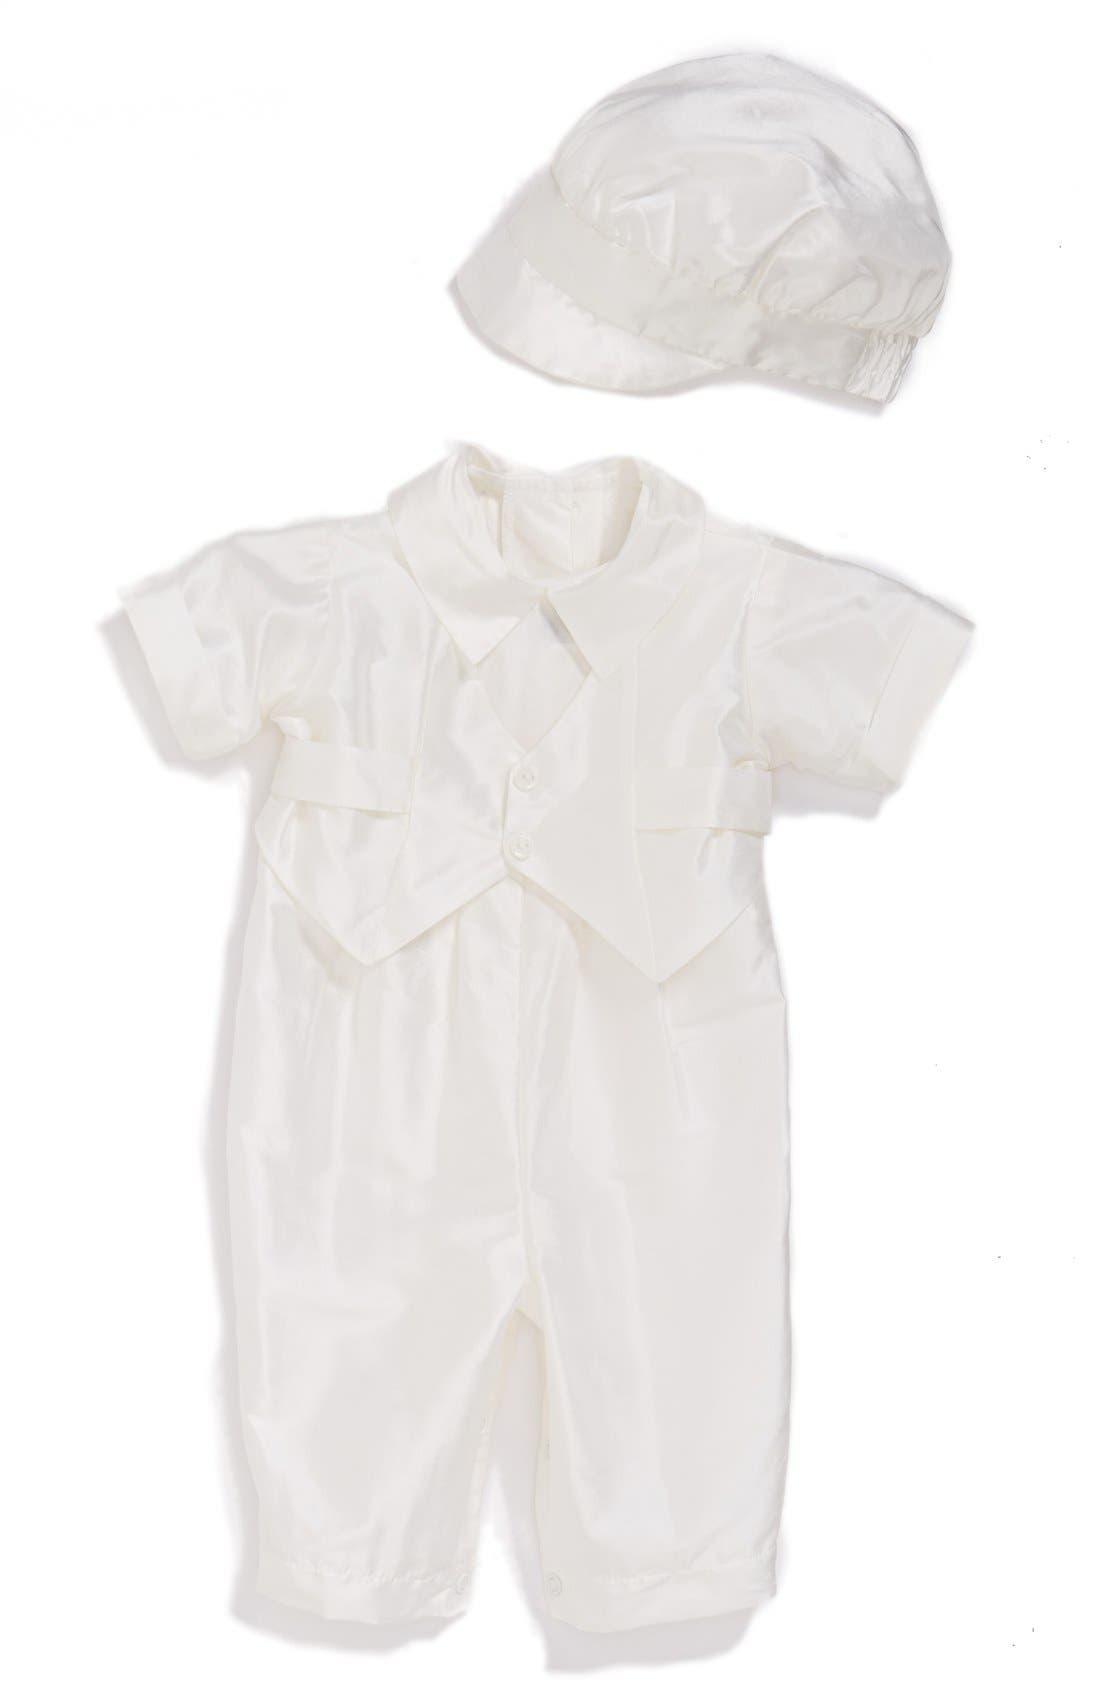 YAGATA Baby Boys Christening Gown